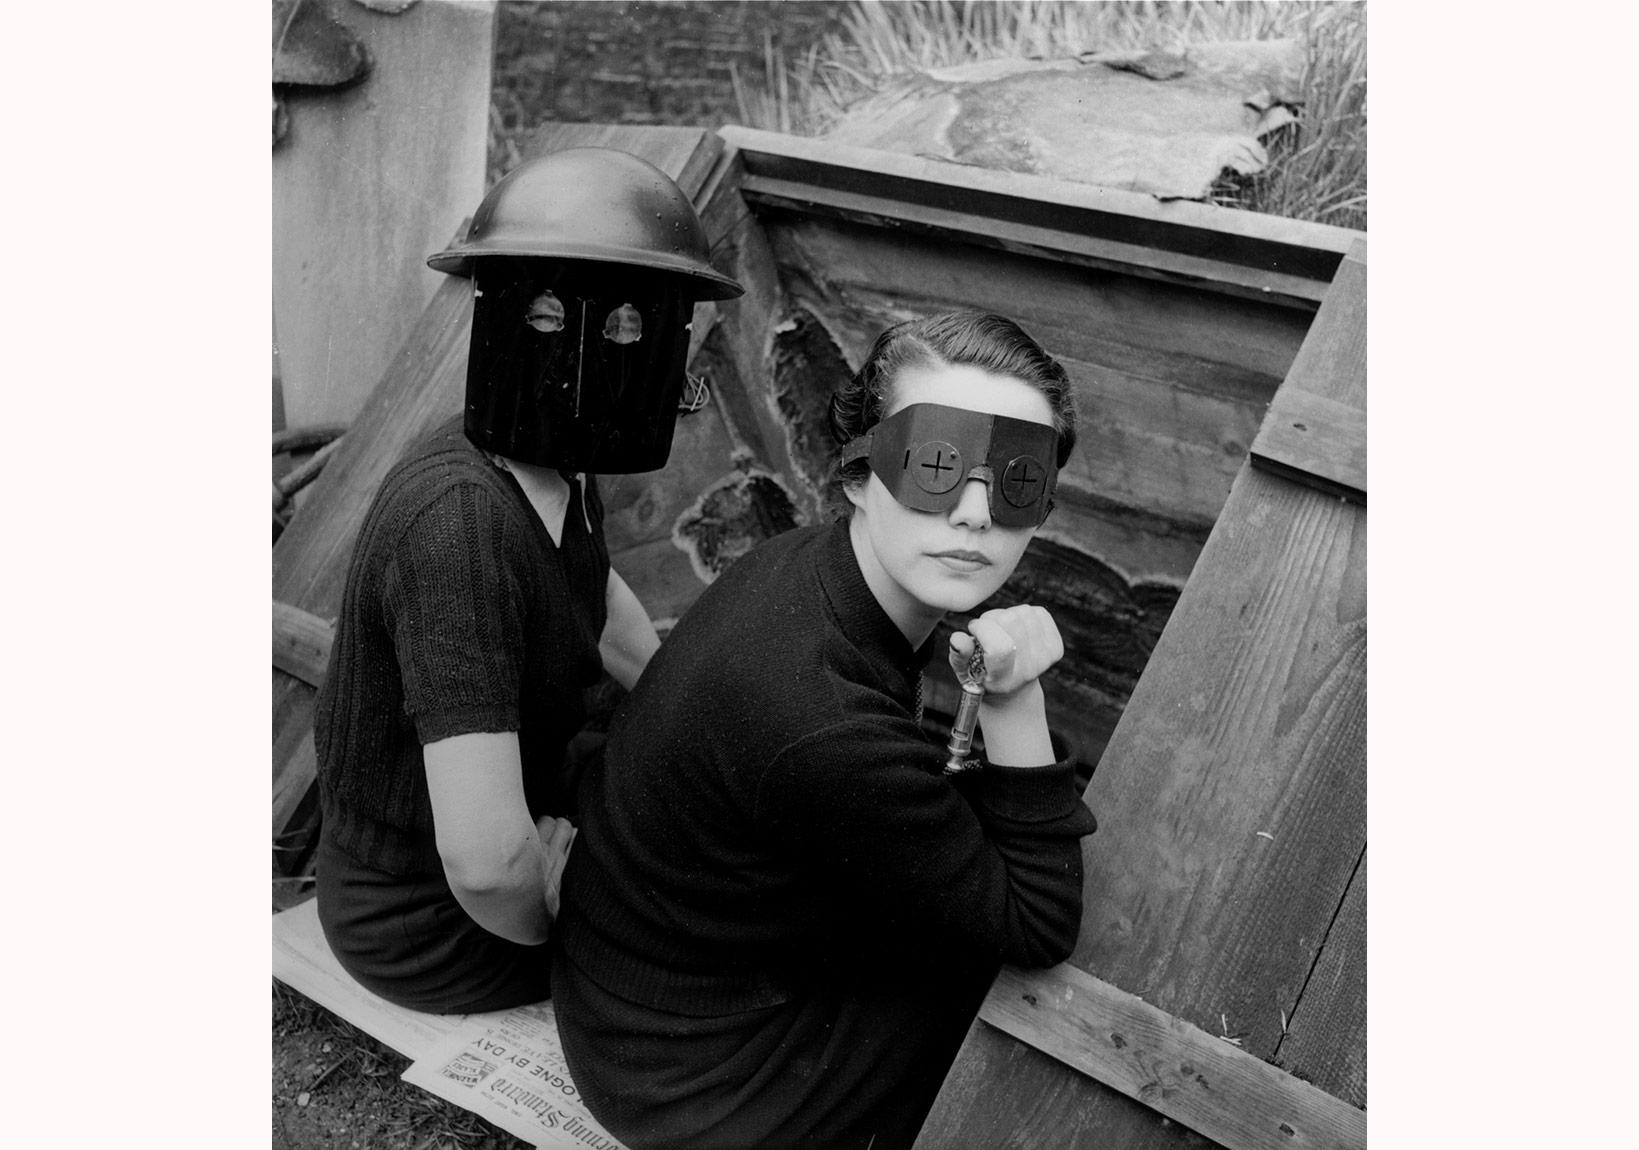 Lee Miller, Ateş maskeleri, Londra, İngiltere, 1941 ©LeeMillerArchives, İngiltere, 2015